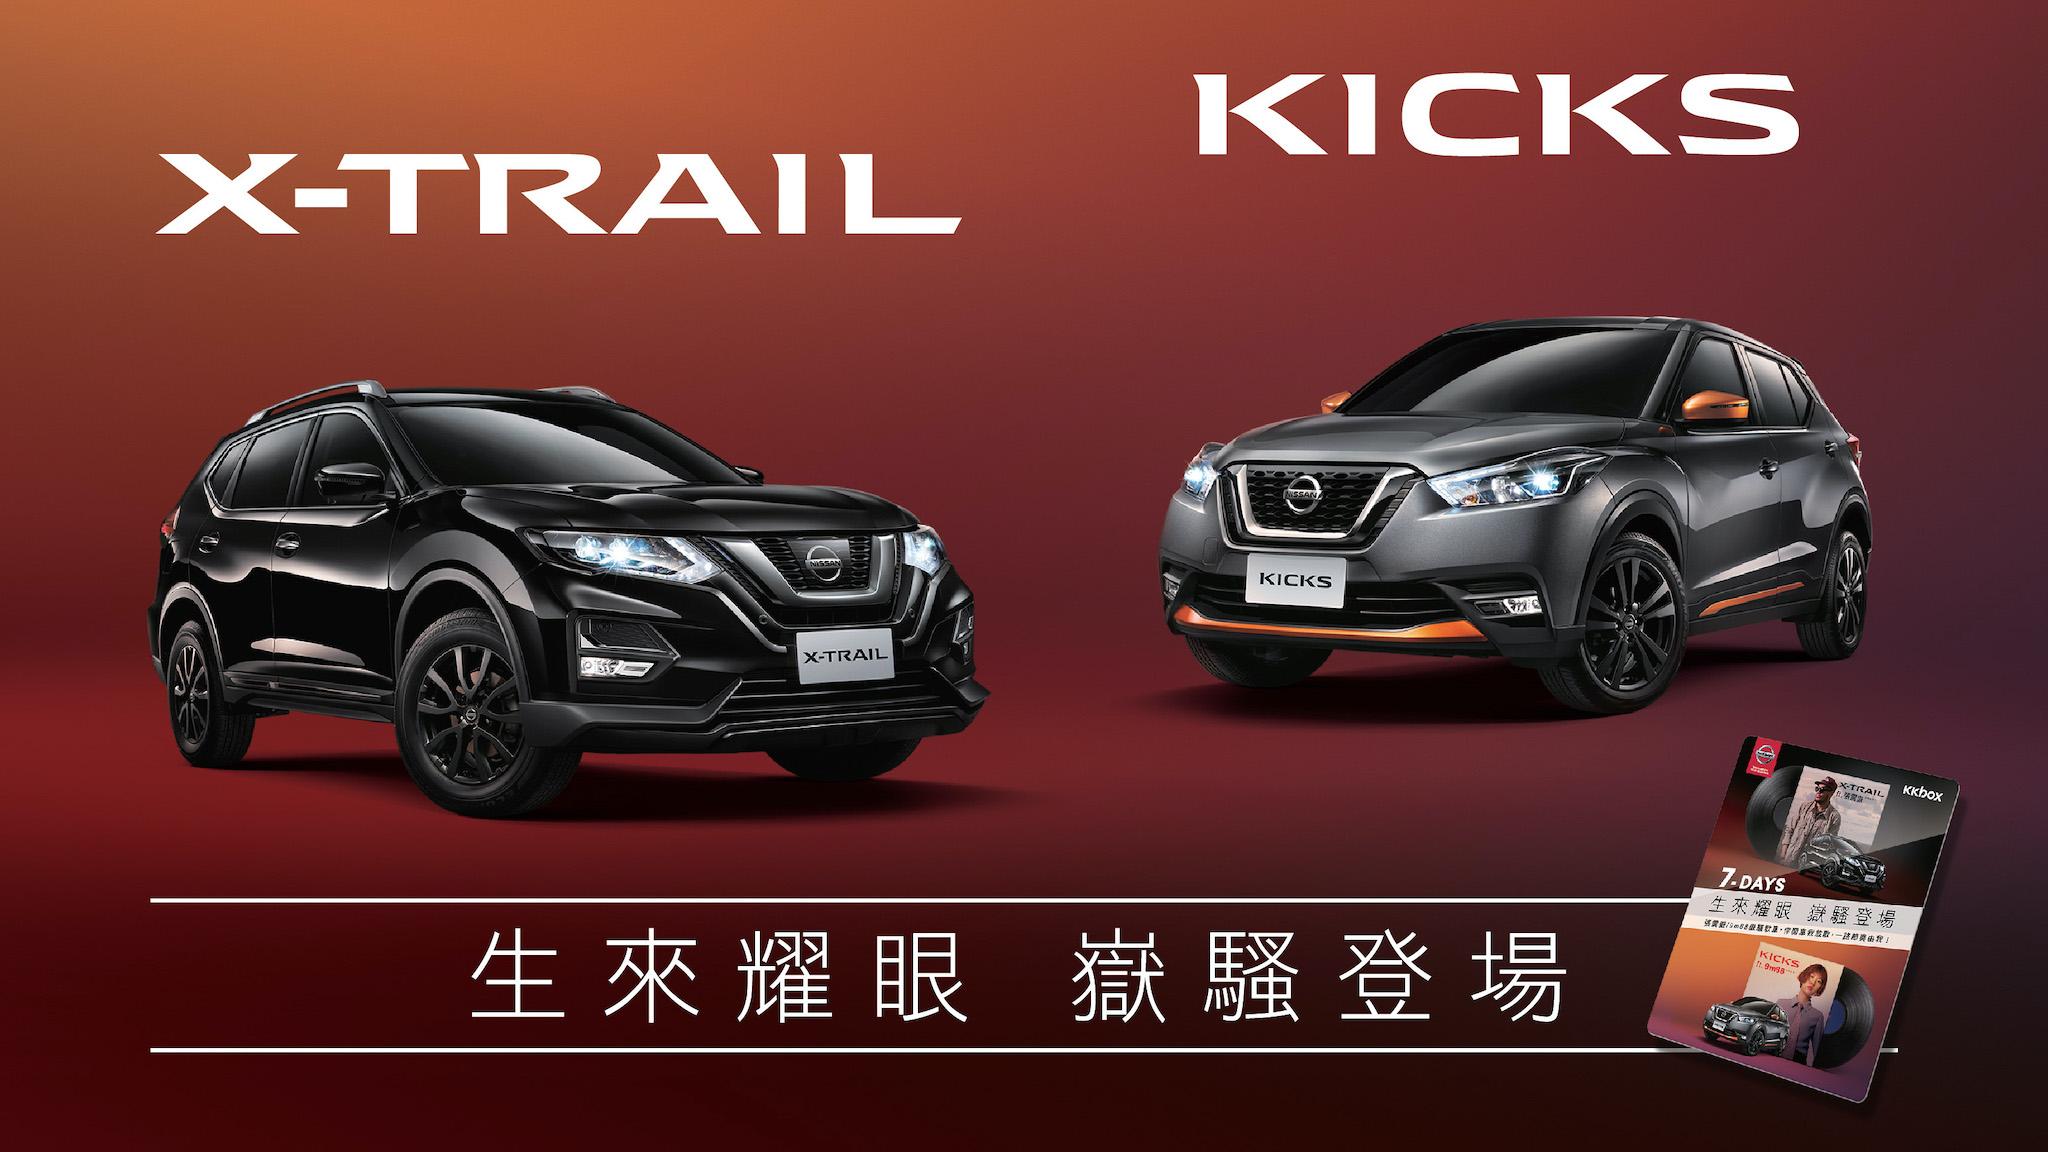 Nissan X-Trail、Kicks「嶽騷特仕車」74.9 萬起限量發售